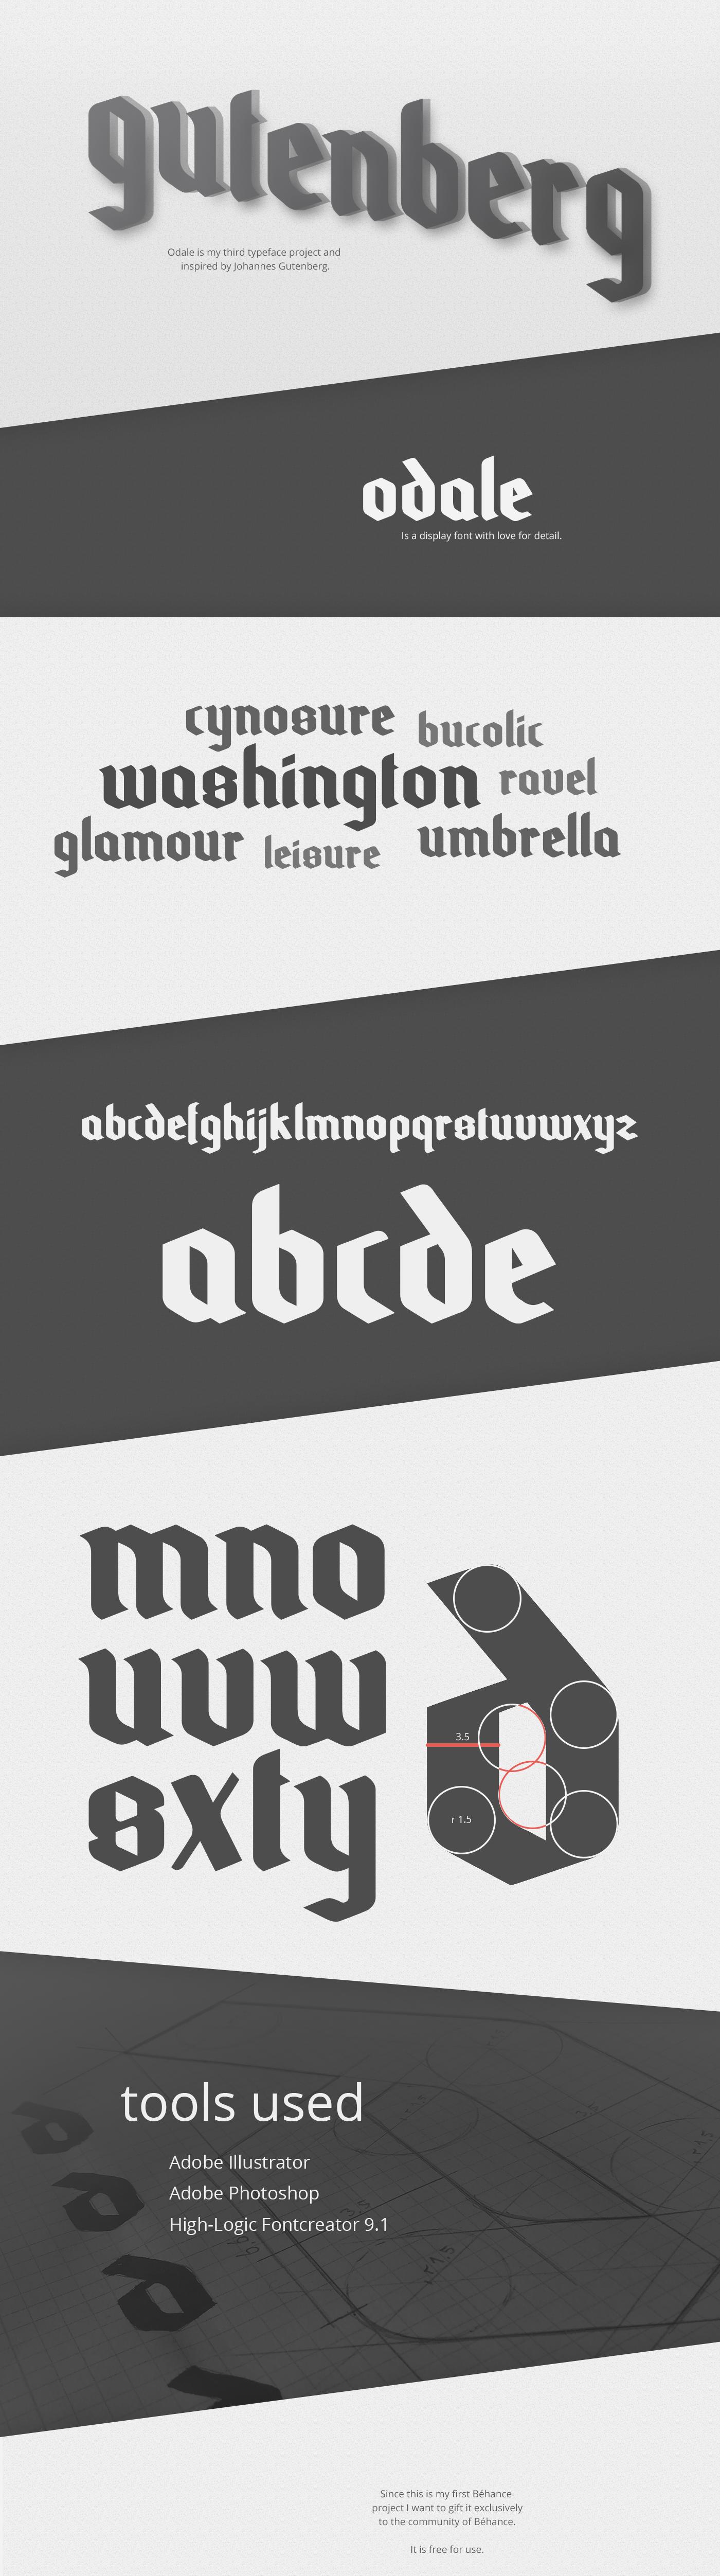 Odale Typeface medieval gothic free font Gutenberg Johannes Gutenberg modern